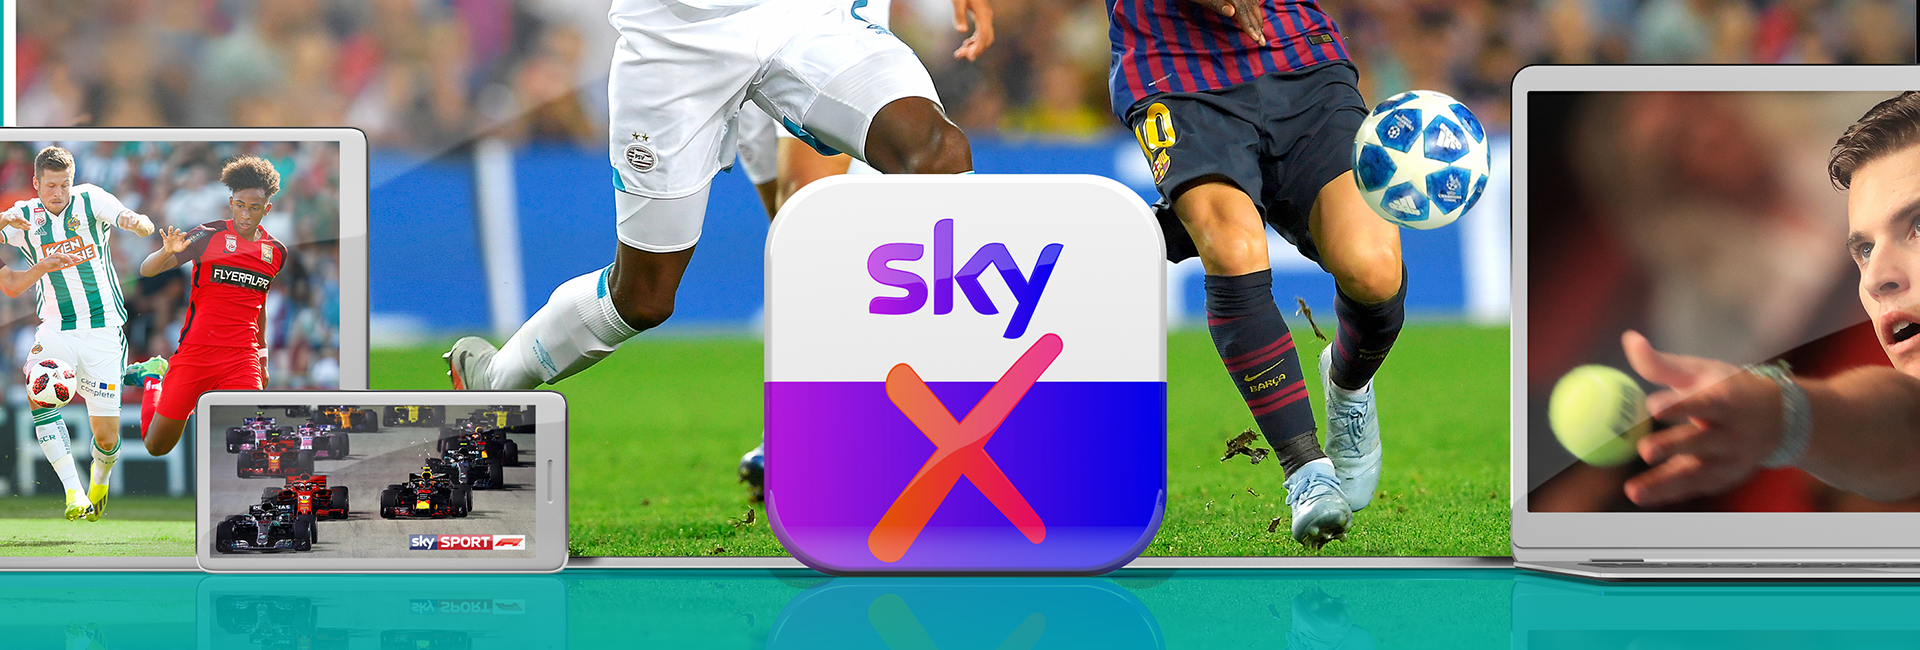 Sky X gratis streamen